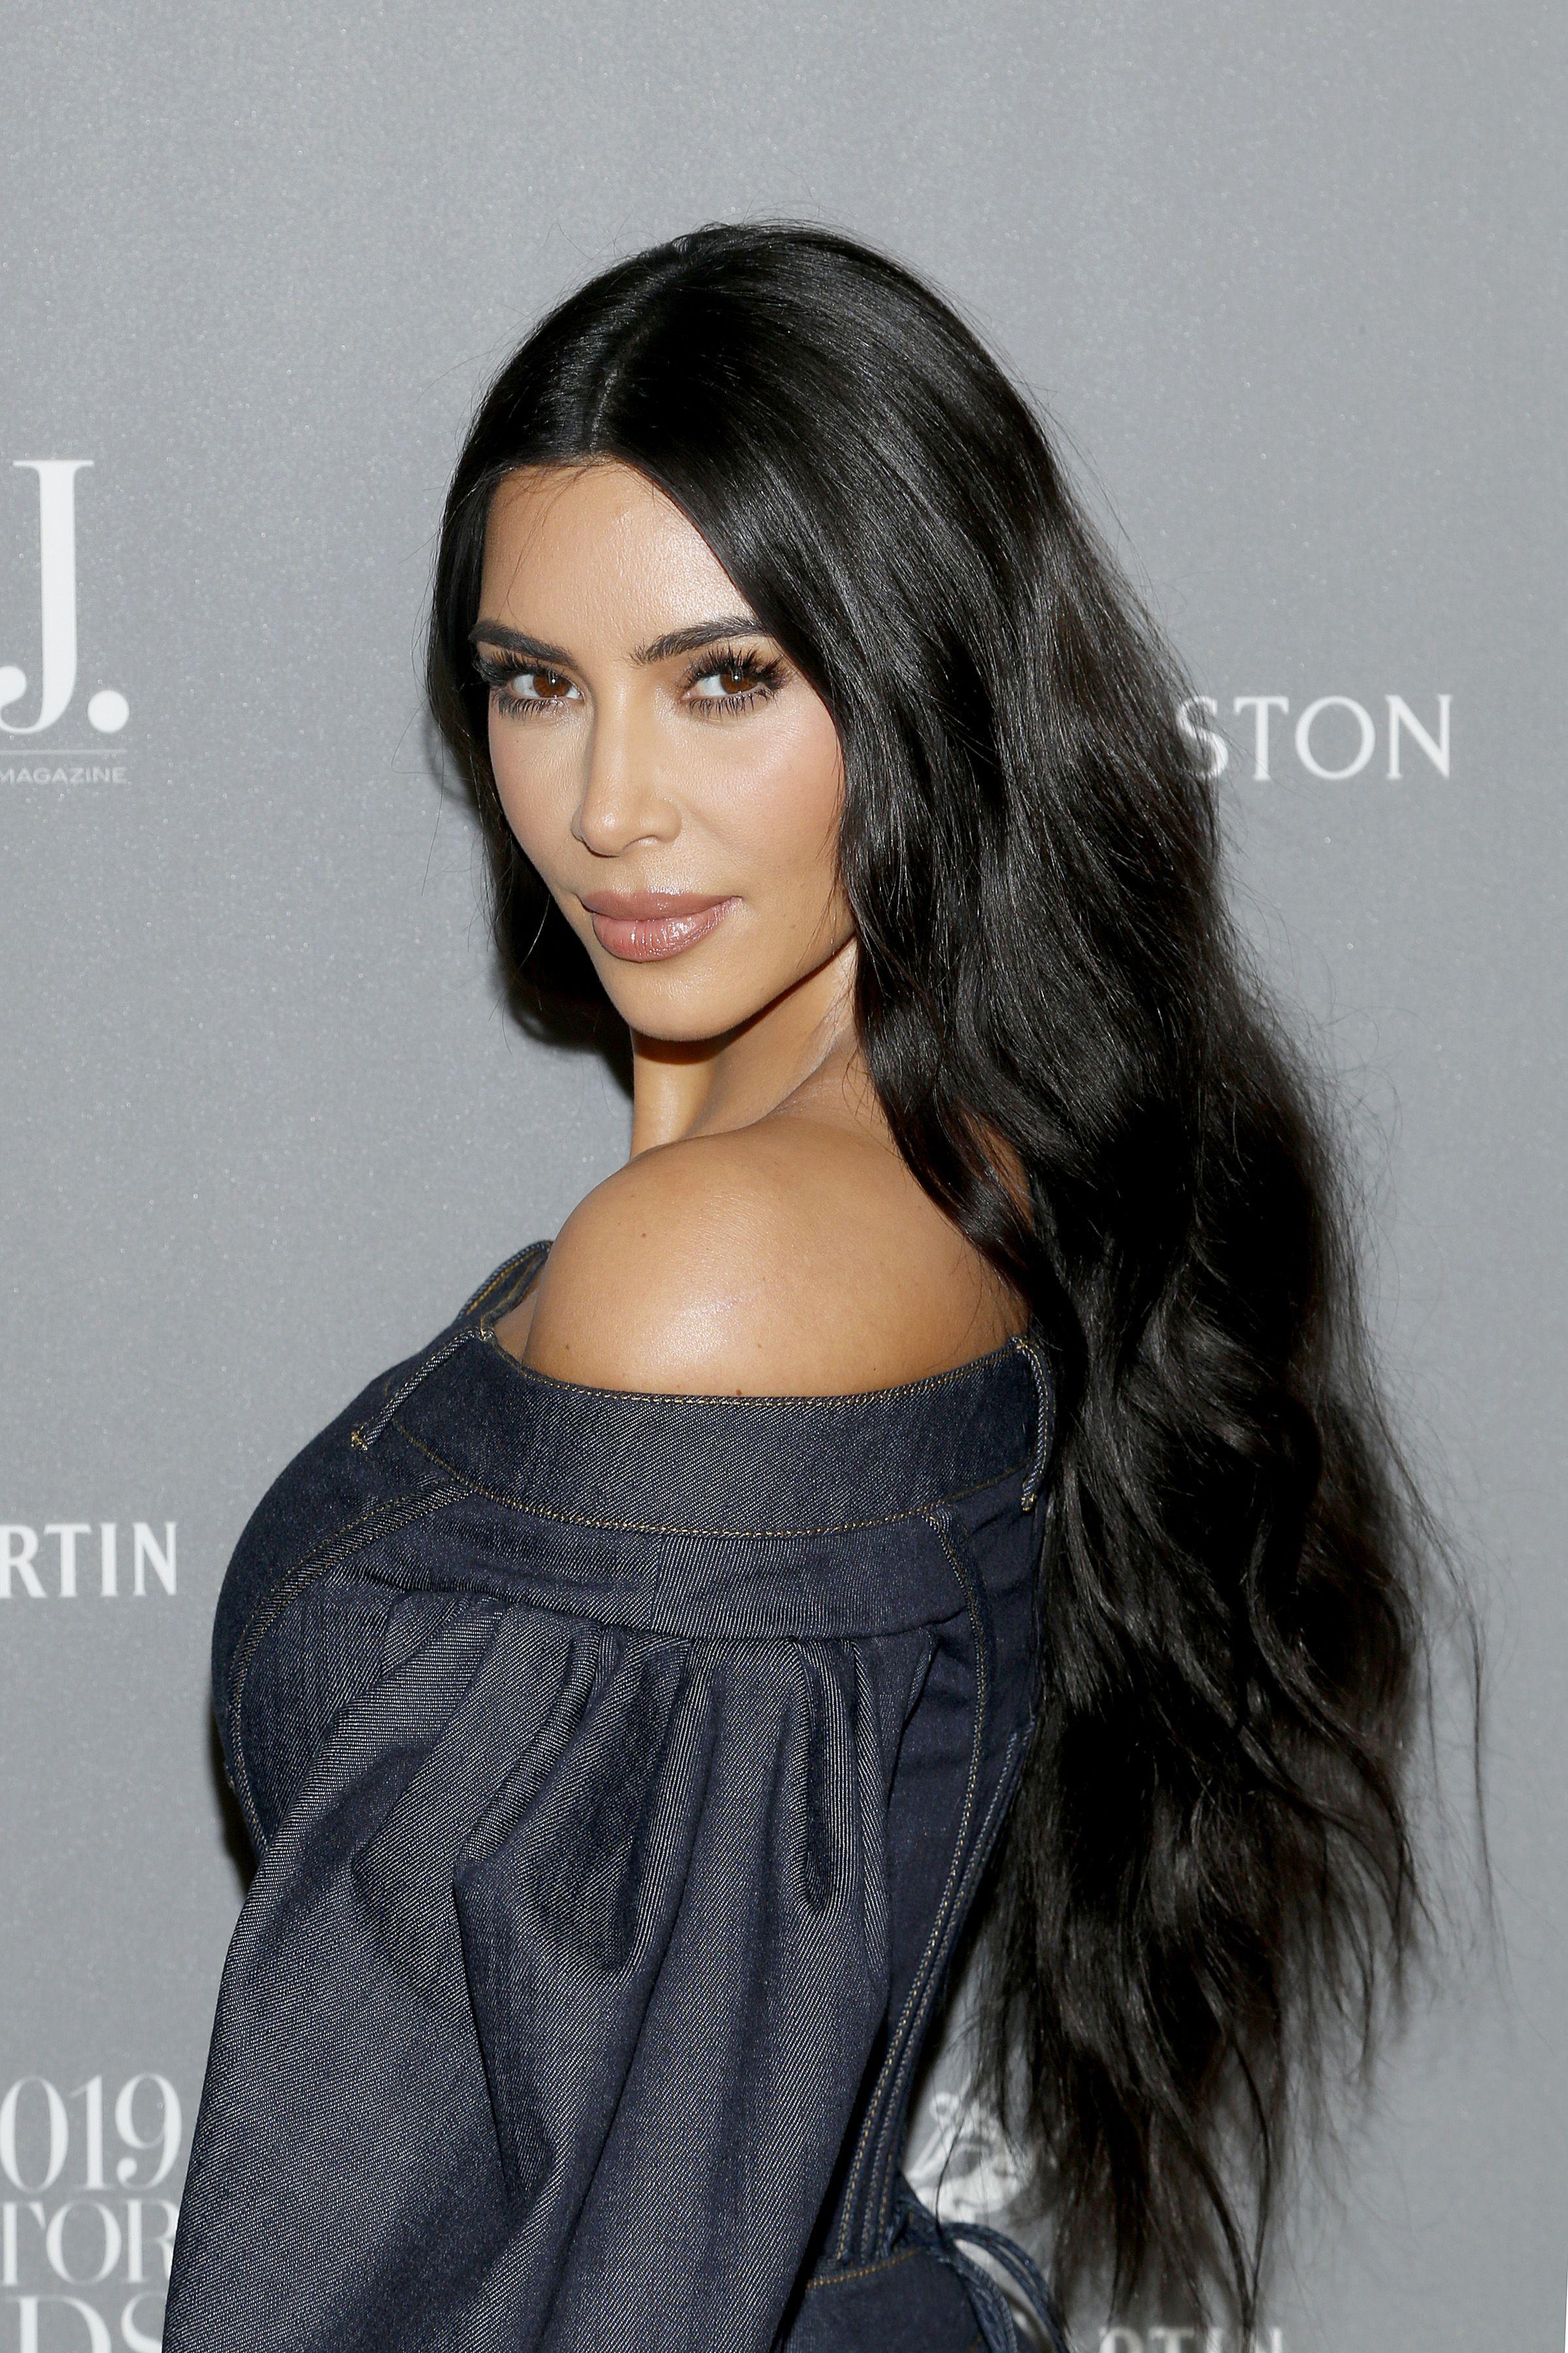 Kim Kardashian just resurrected the dip dye hair trend